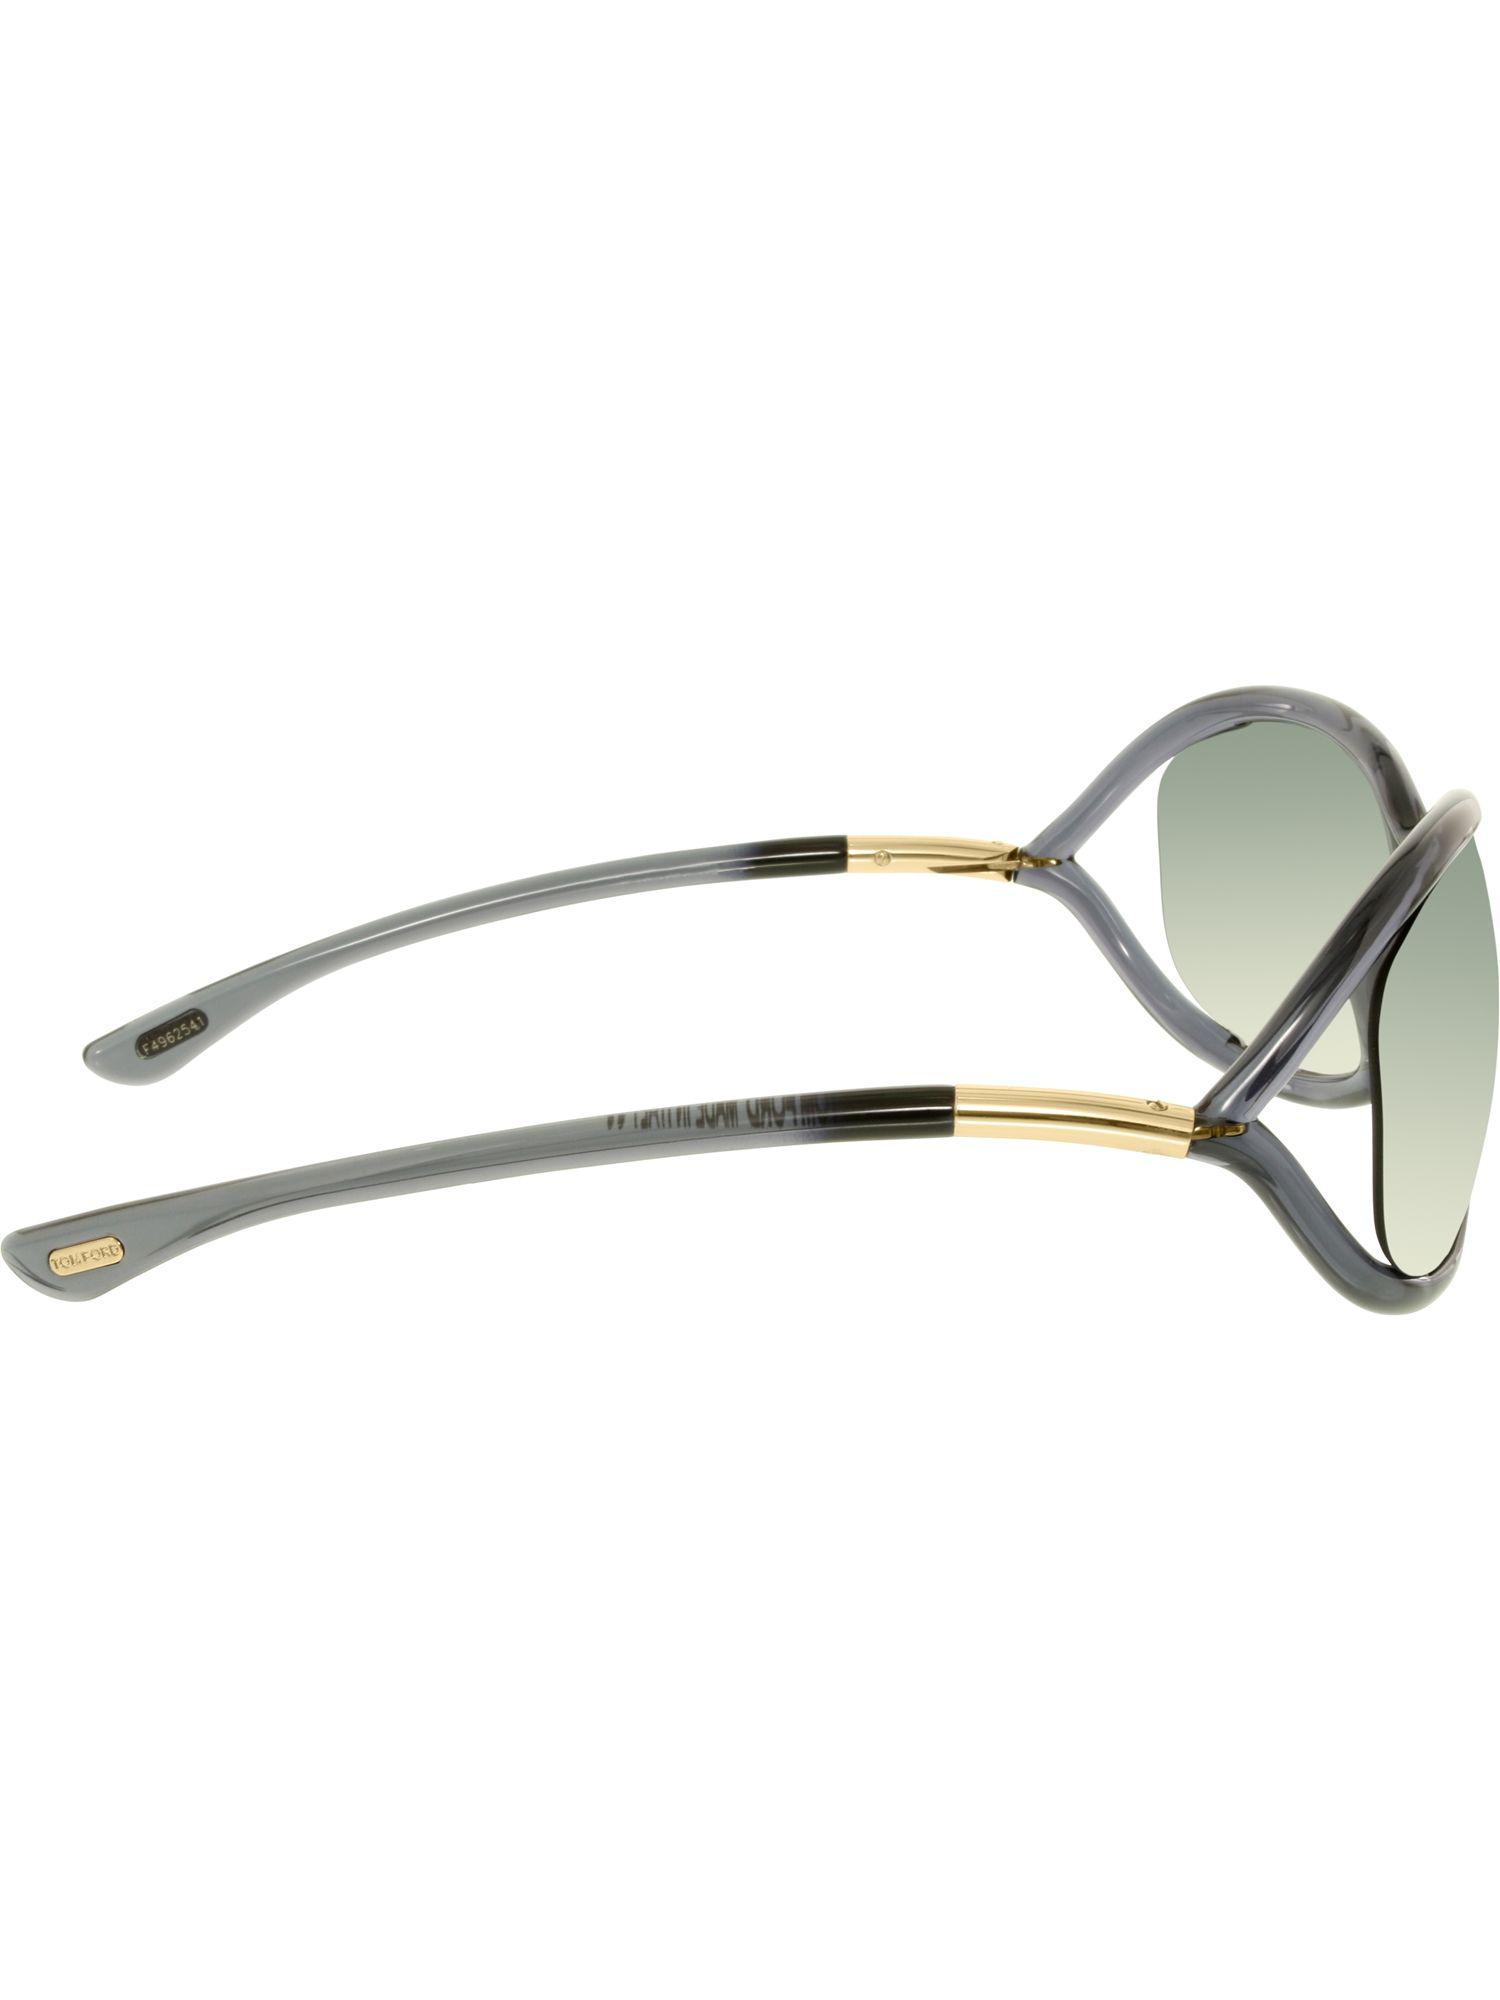 87fc0c5d0e4 Lyst - Tom Ford Women s Gradient Jennifer Ft0008-0b5-61 Black Square  Sunglasses in Black